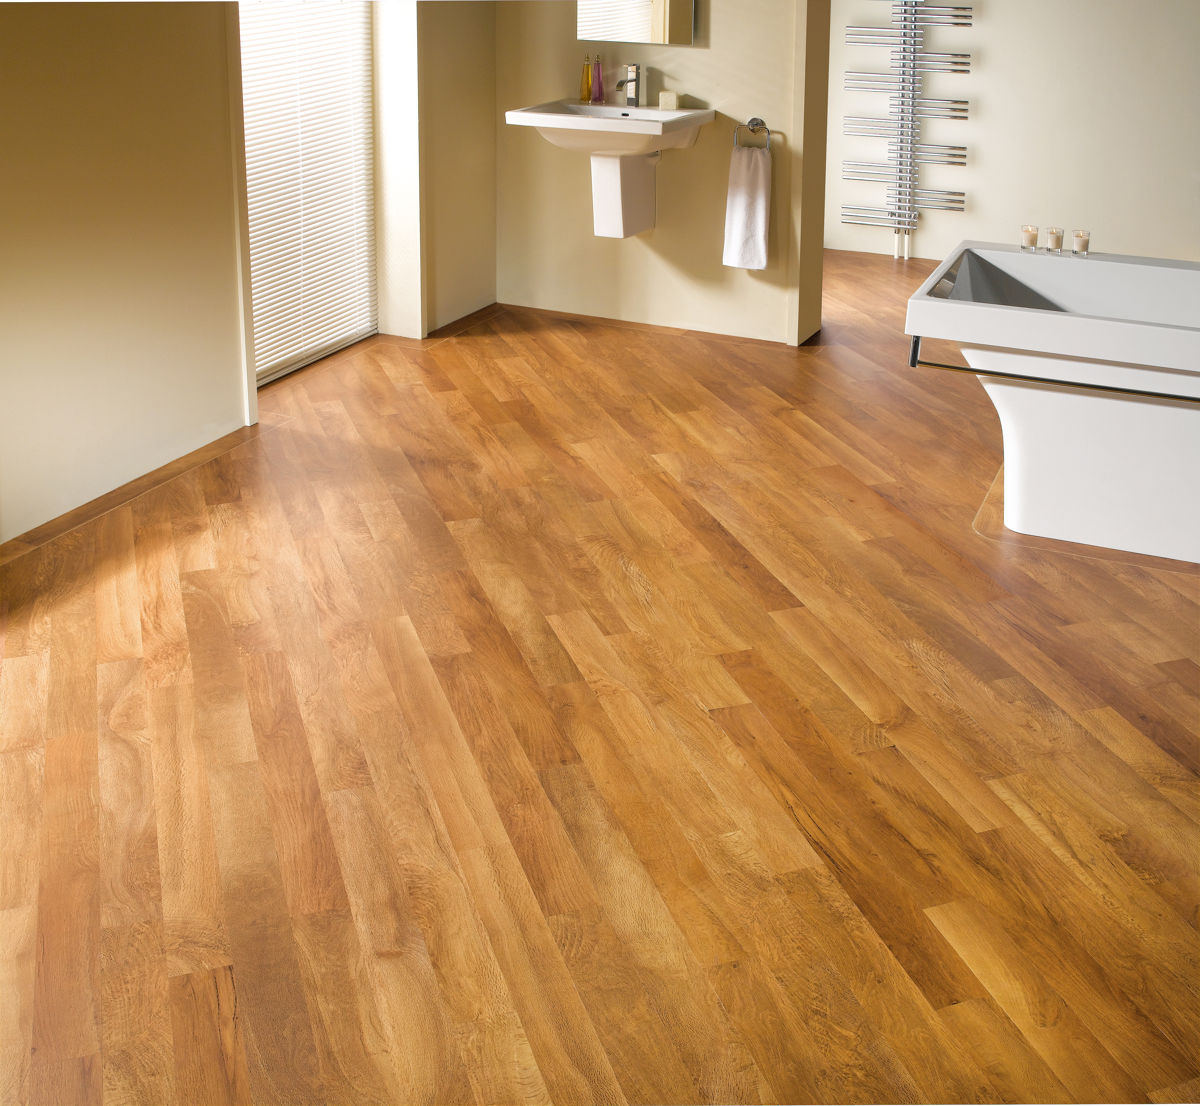 karndean knight tile aran oak kp67 vinyl flooring. Black Bedroom Furniture Sets. Home Design Ideas